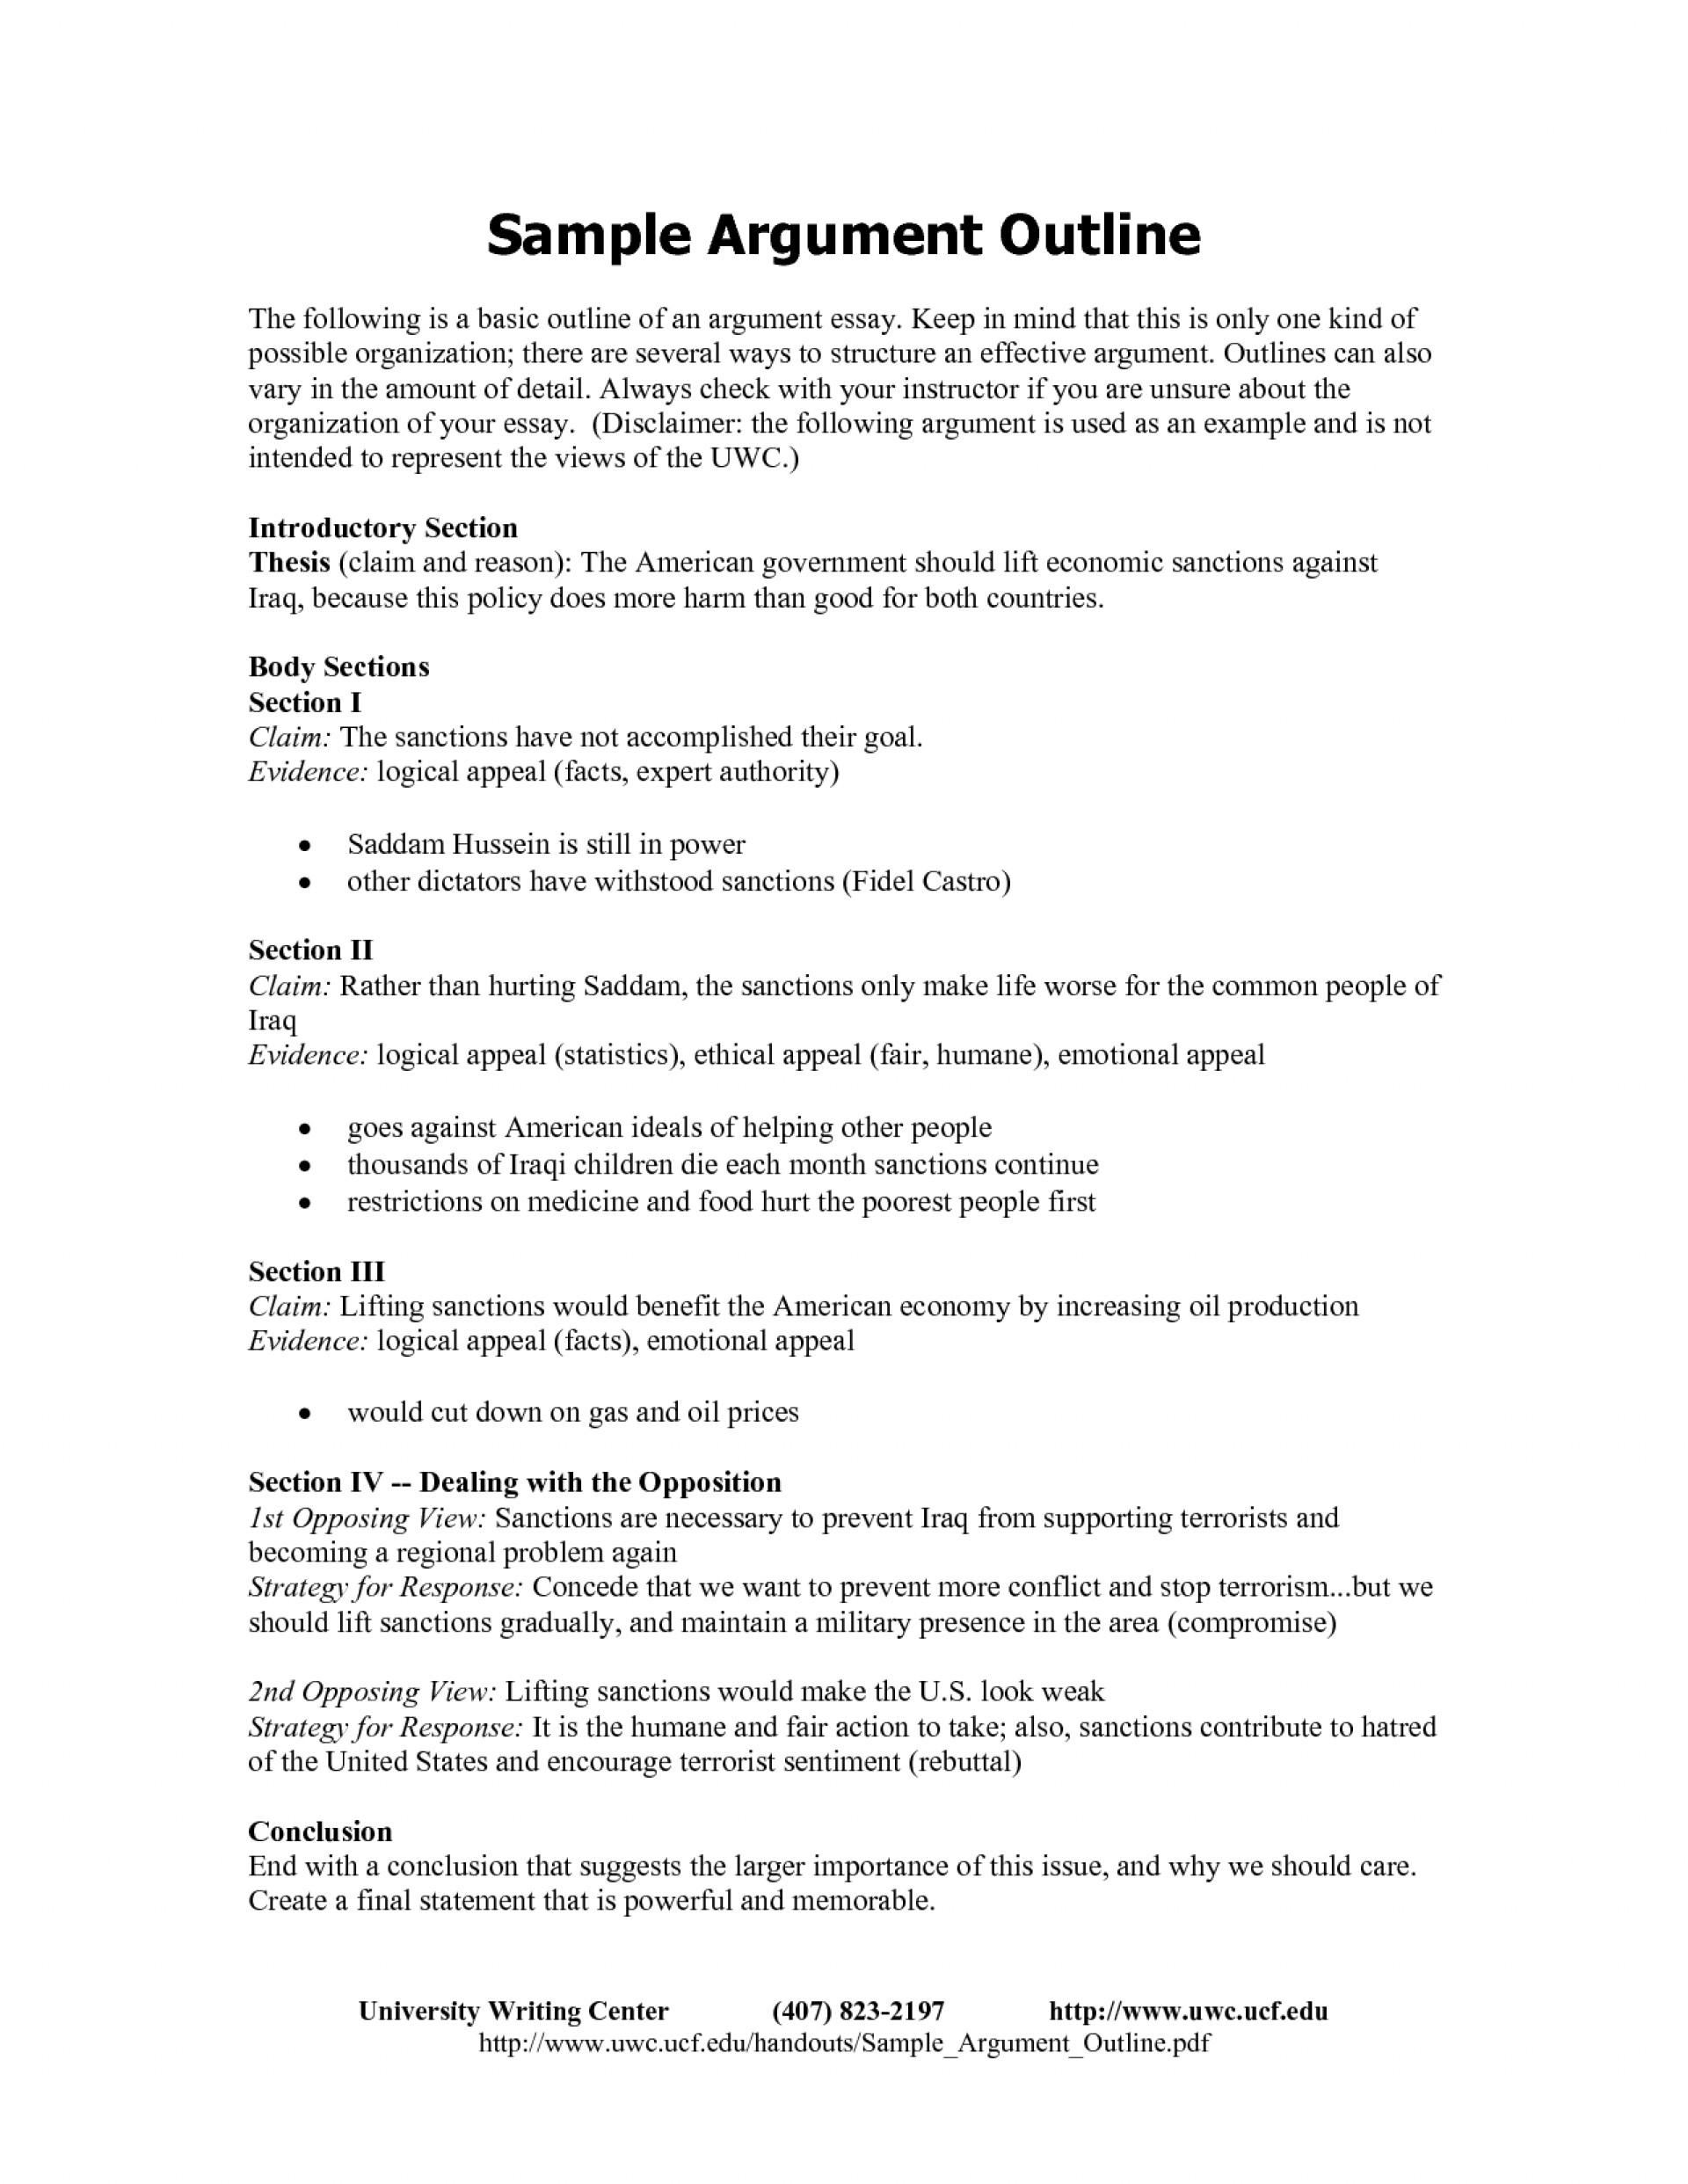 Airport Signage and Pavement Marking Management Procedures essays uk